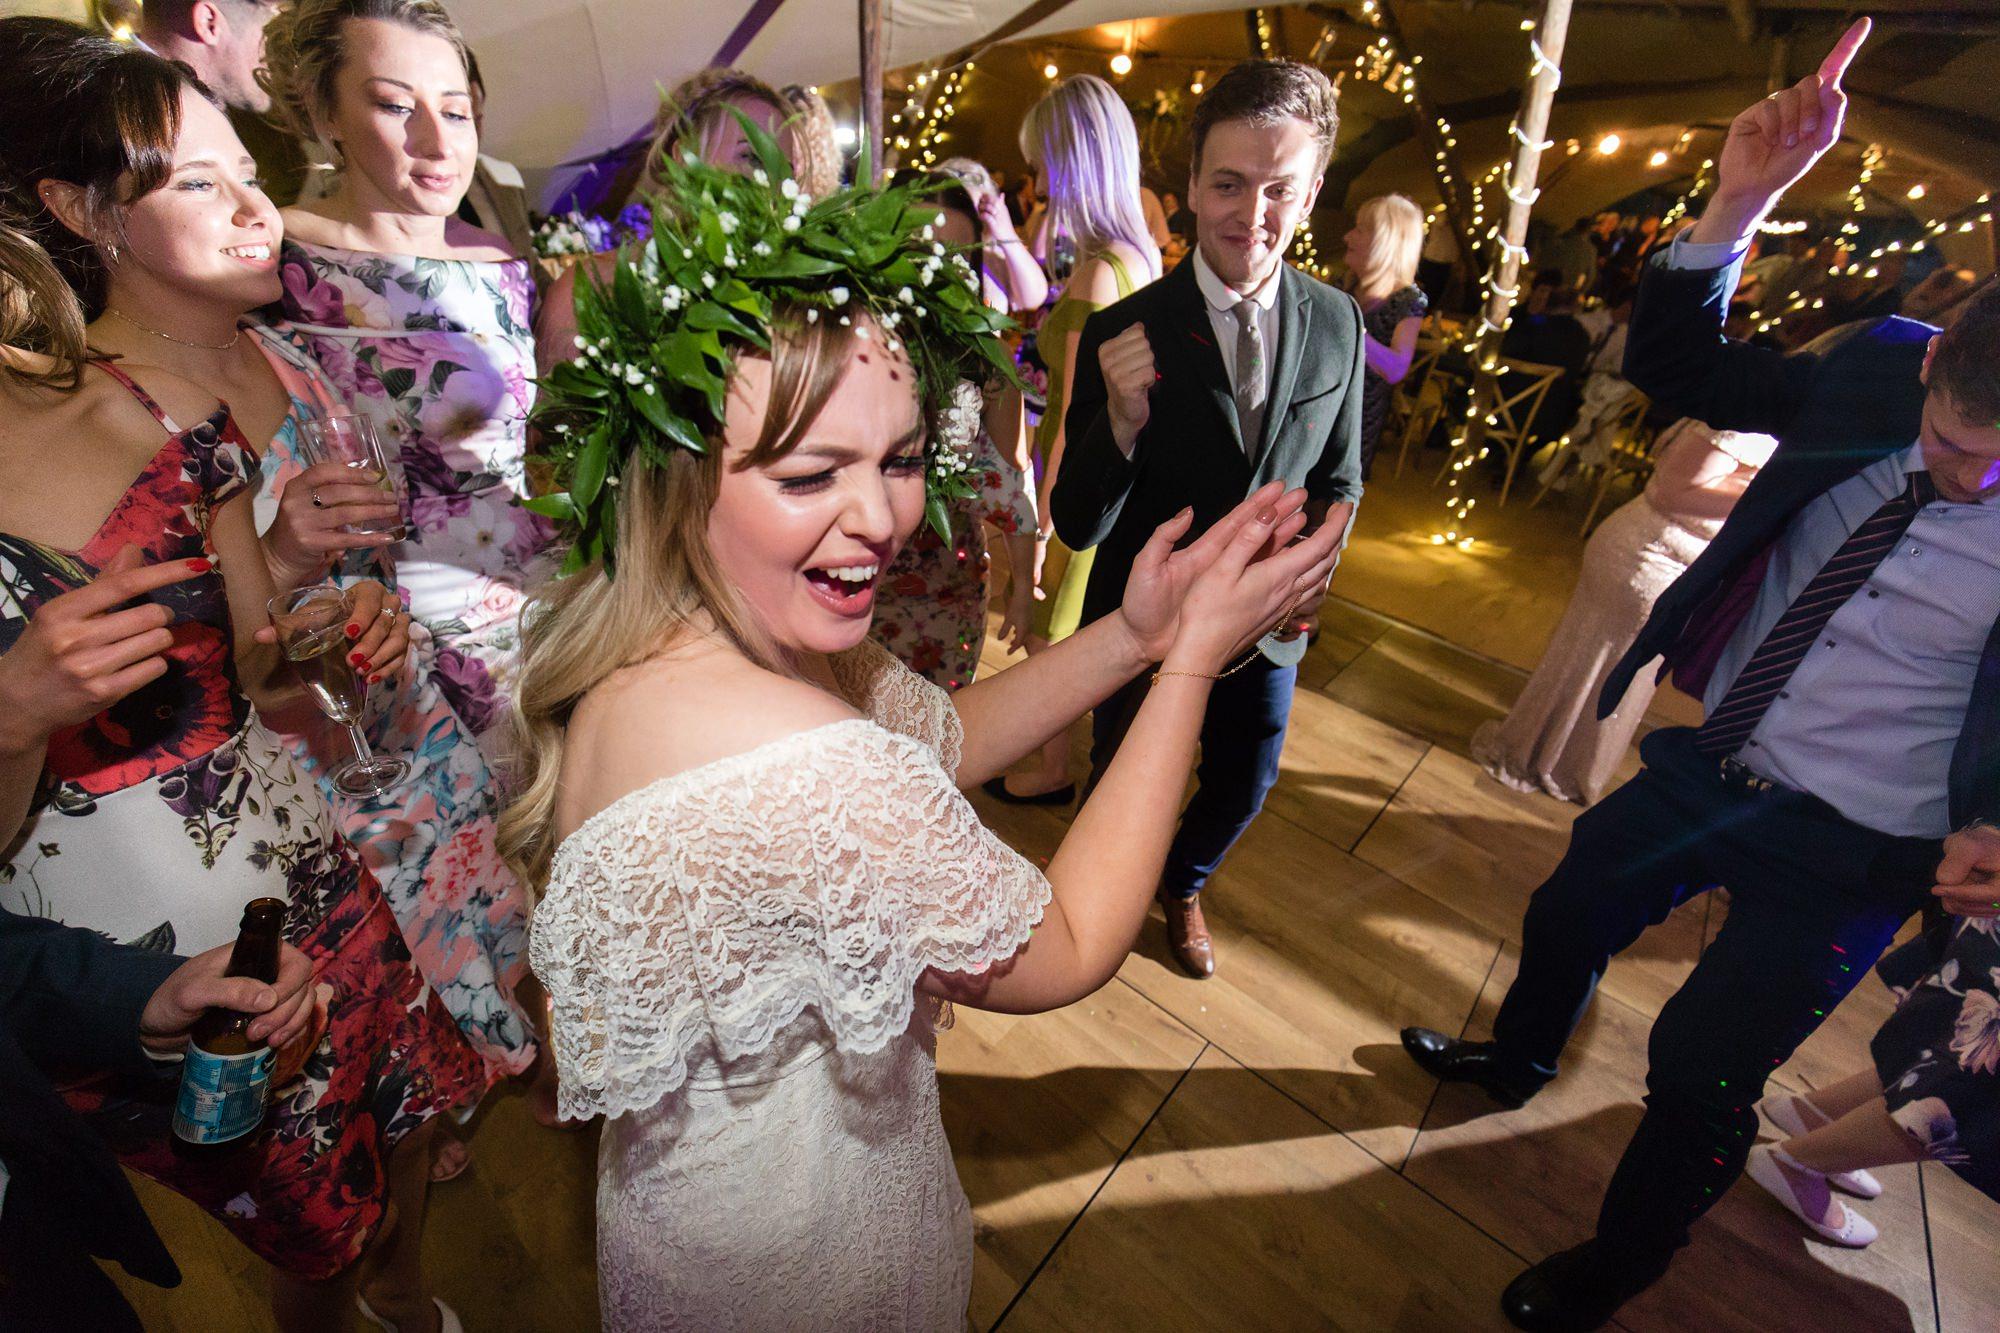 Villa farm wedding photography bride claps and dances